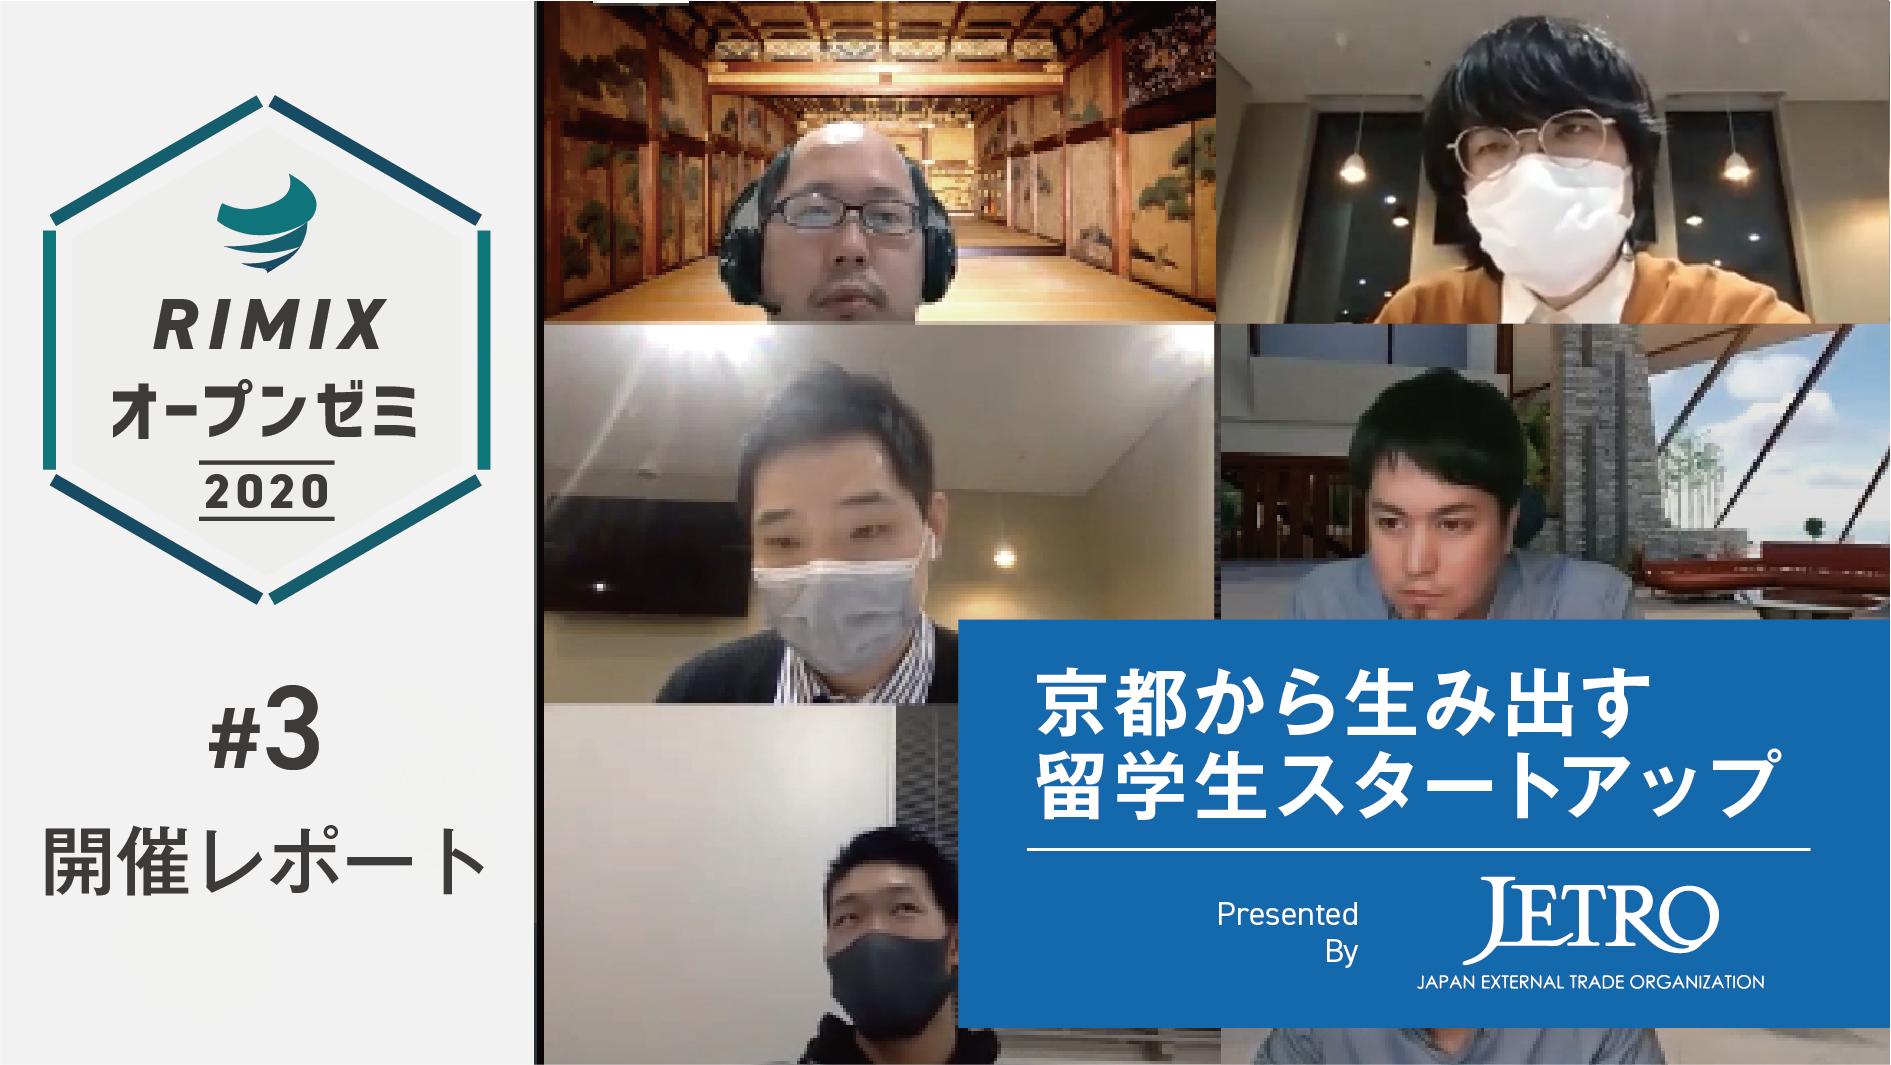 【RIMIXオープンゼミ#3】京都から生み出す留学生スタートアップ Presented by JETRO 開催レポート